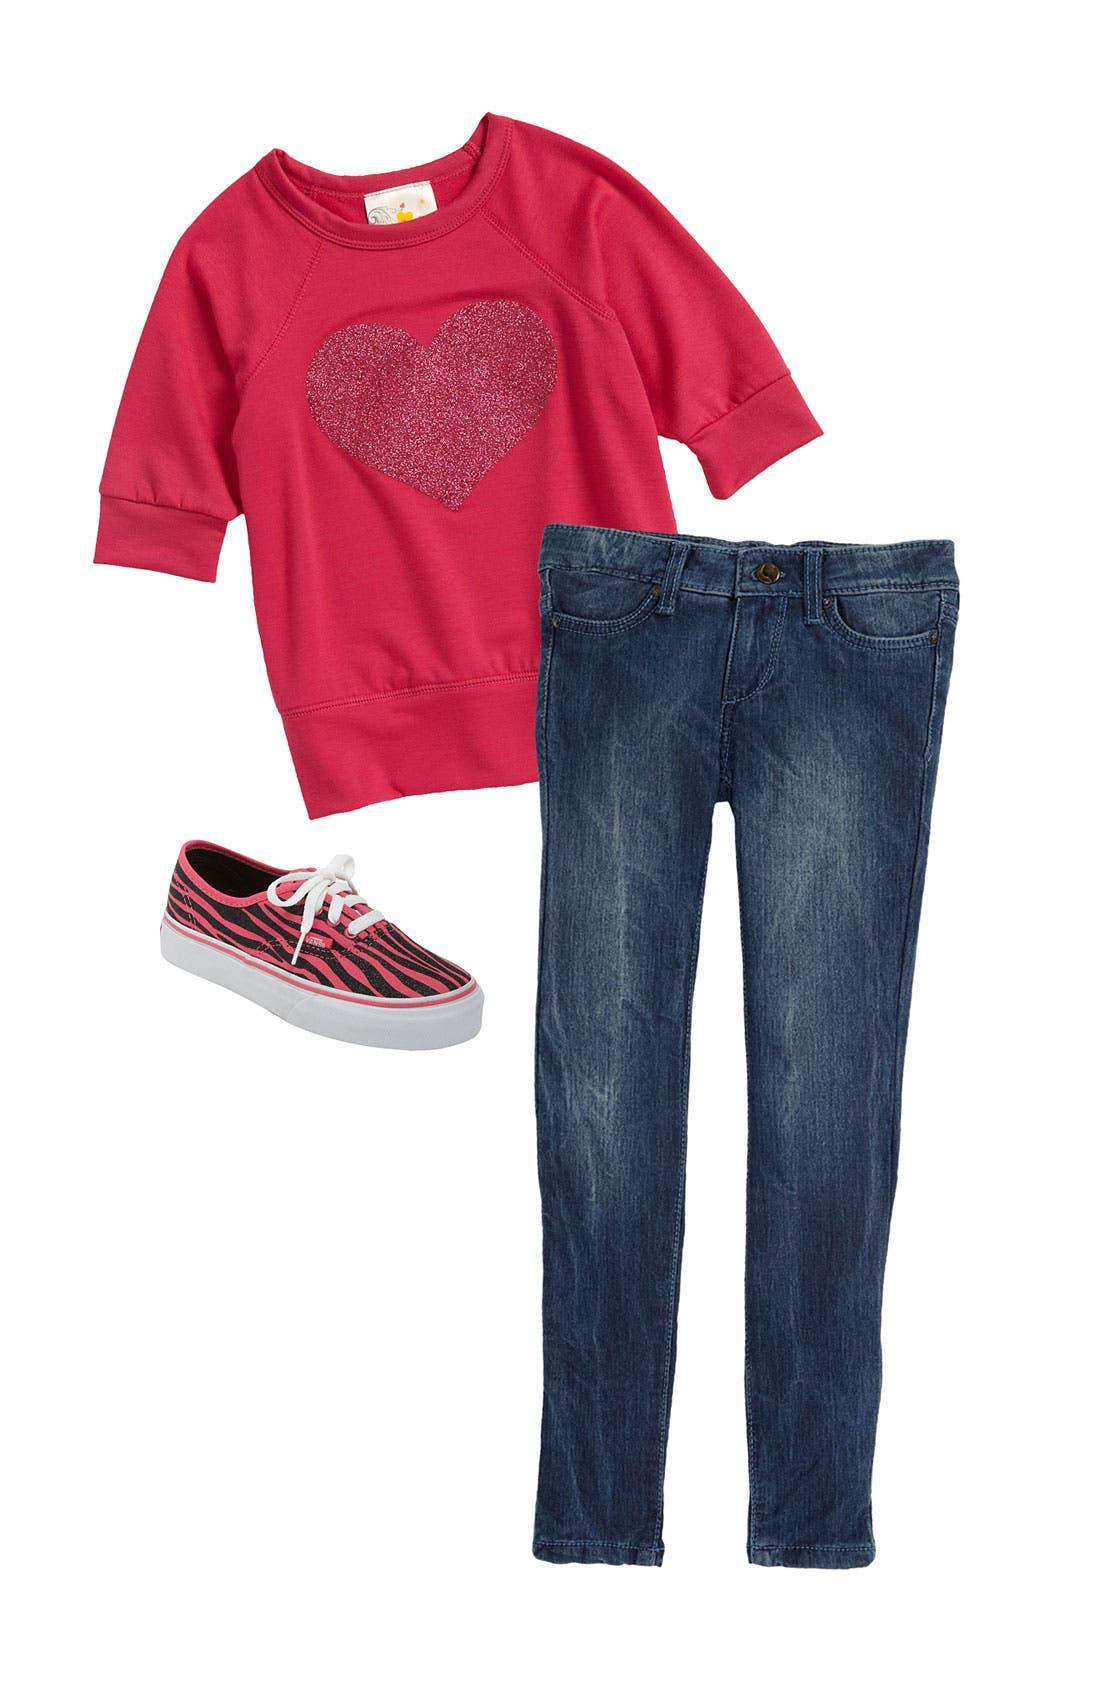 Main Image - Jenna & Jessie Sweater & Joe's Jeans (Little Girls)